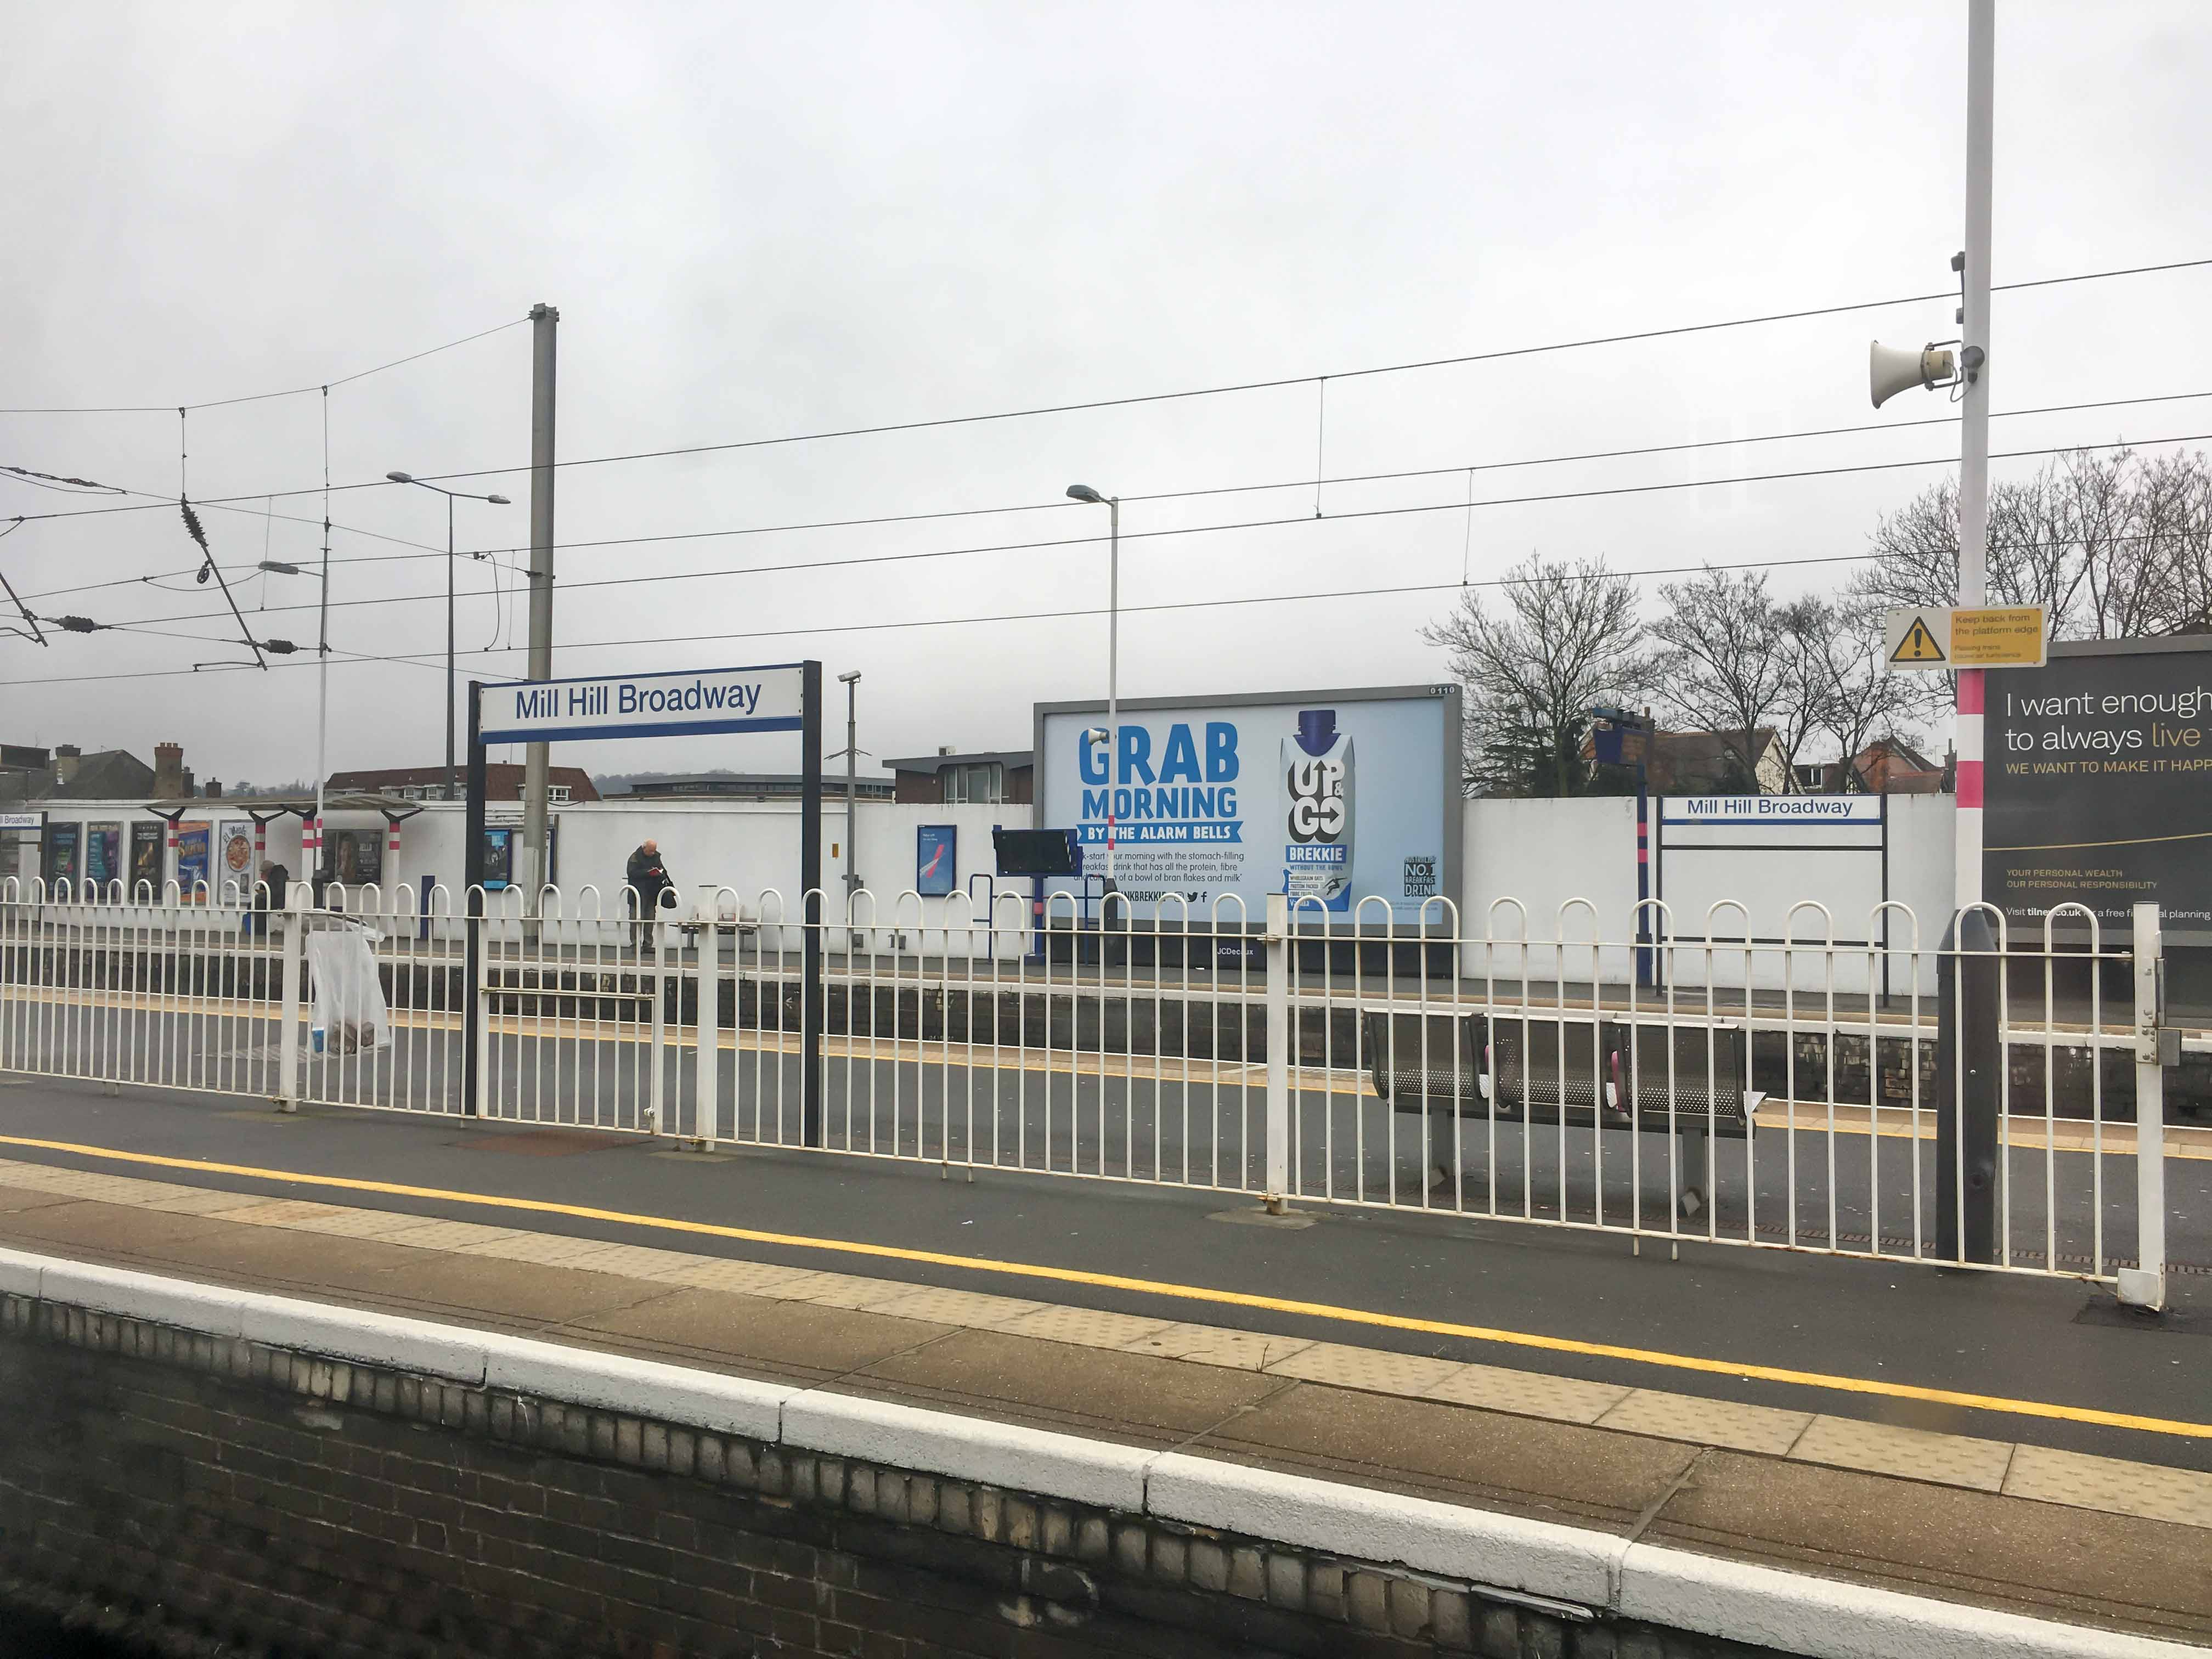 Bahnhof Mill Hill Boradway